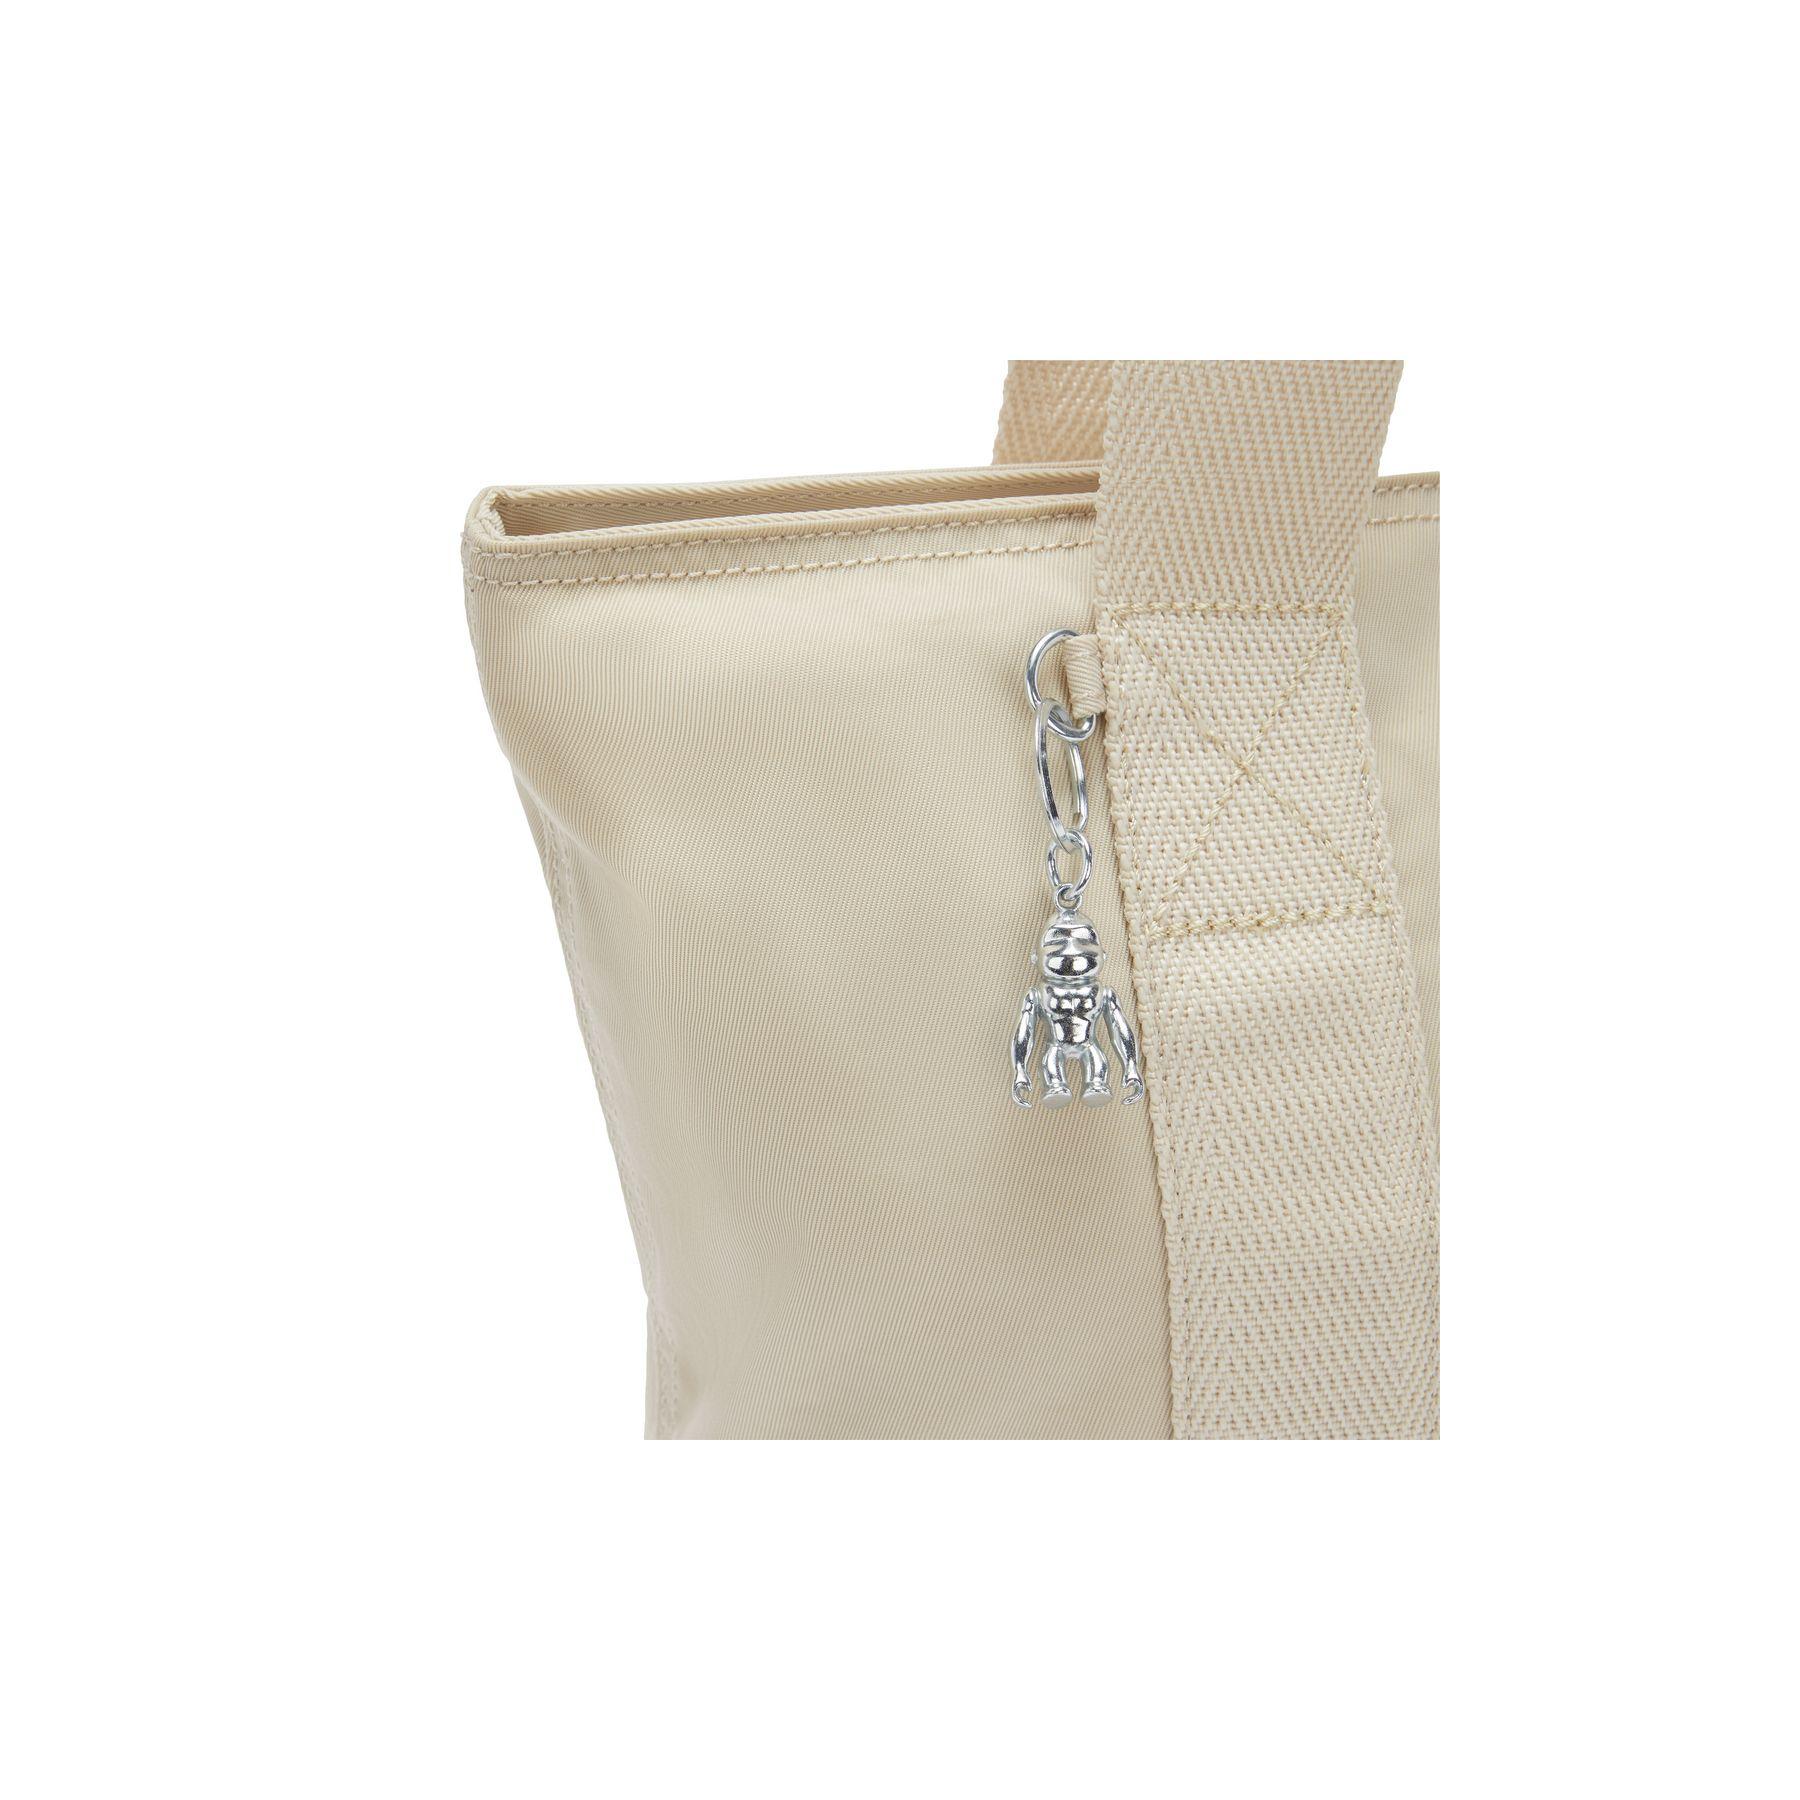 ERA M BAGS by Kipling